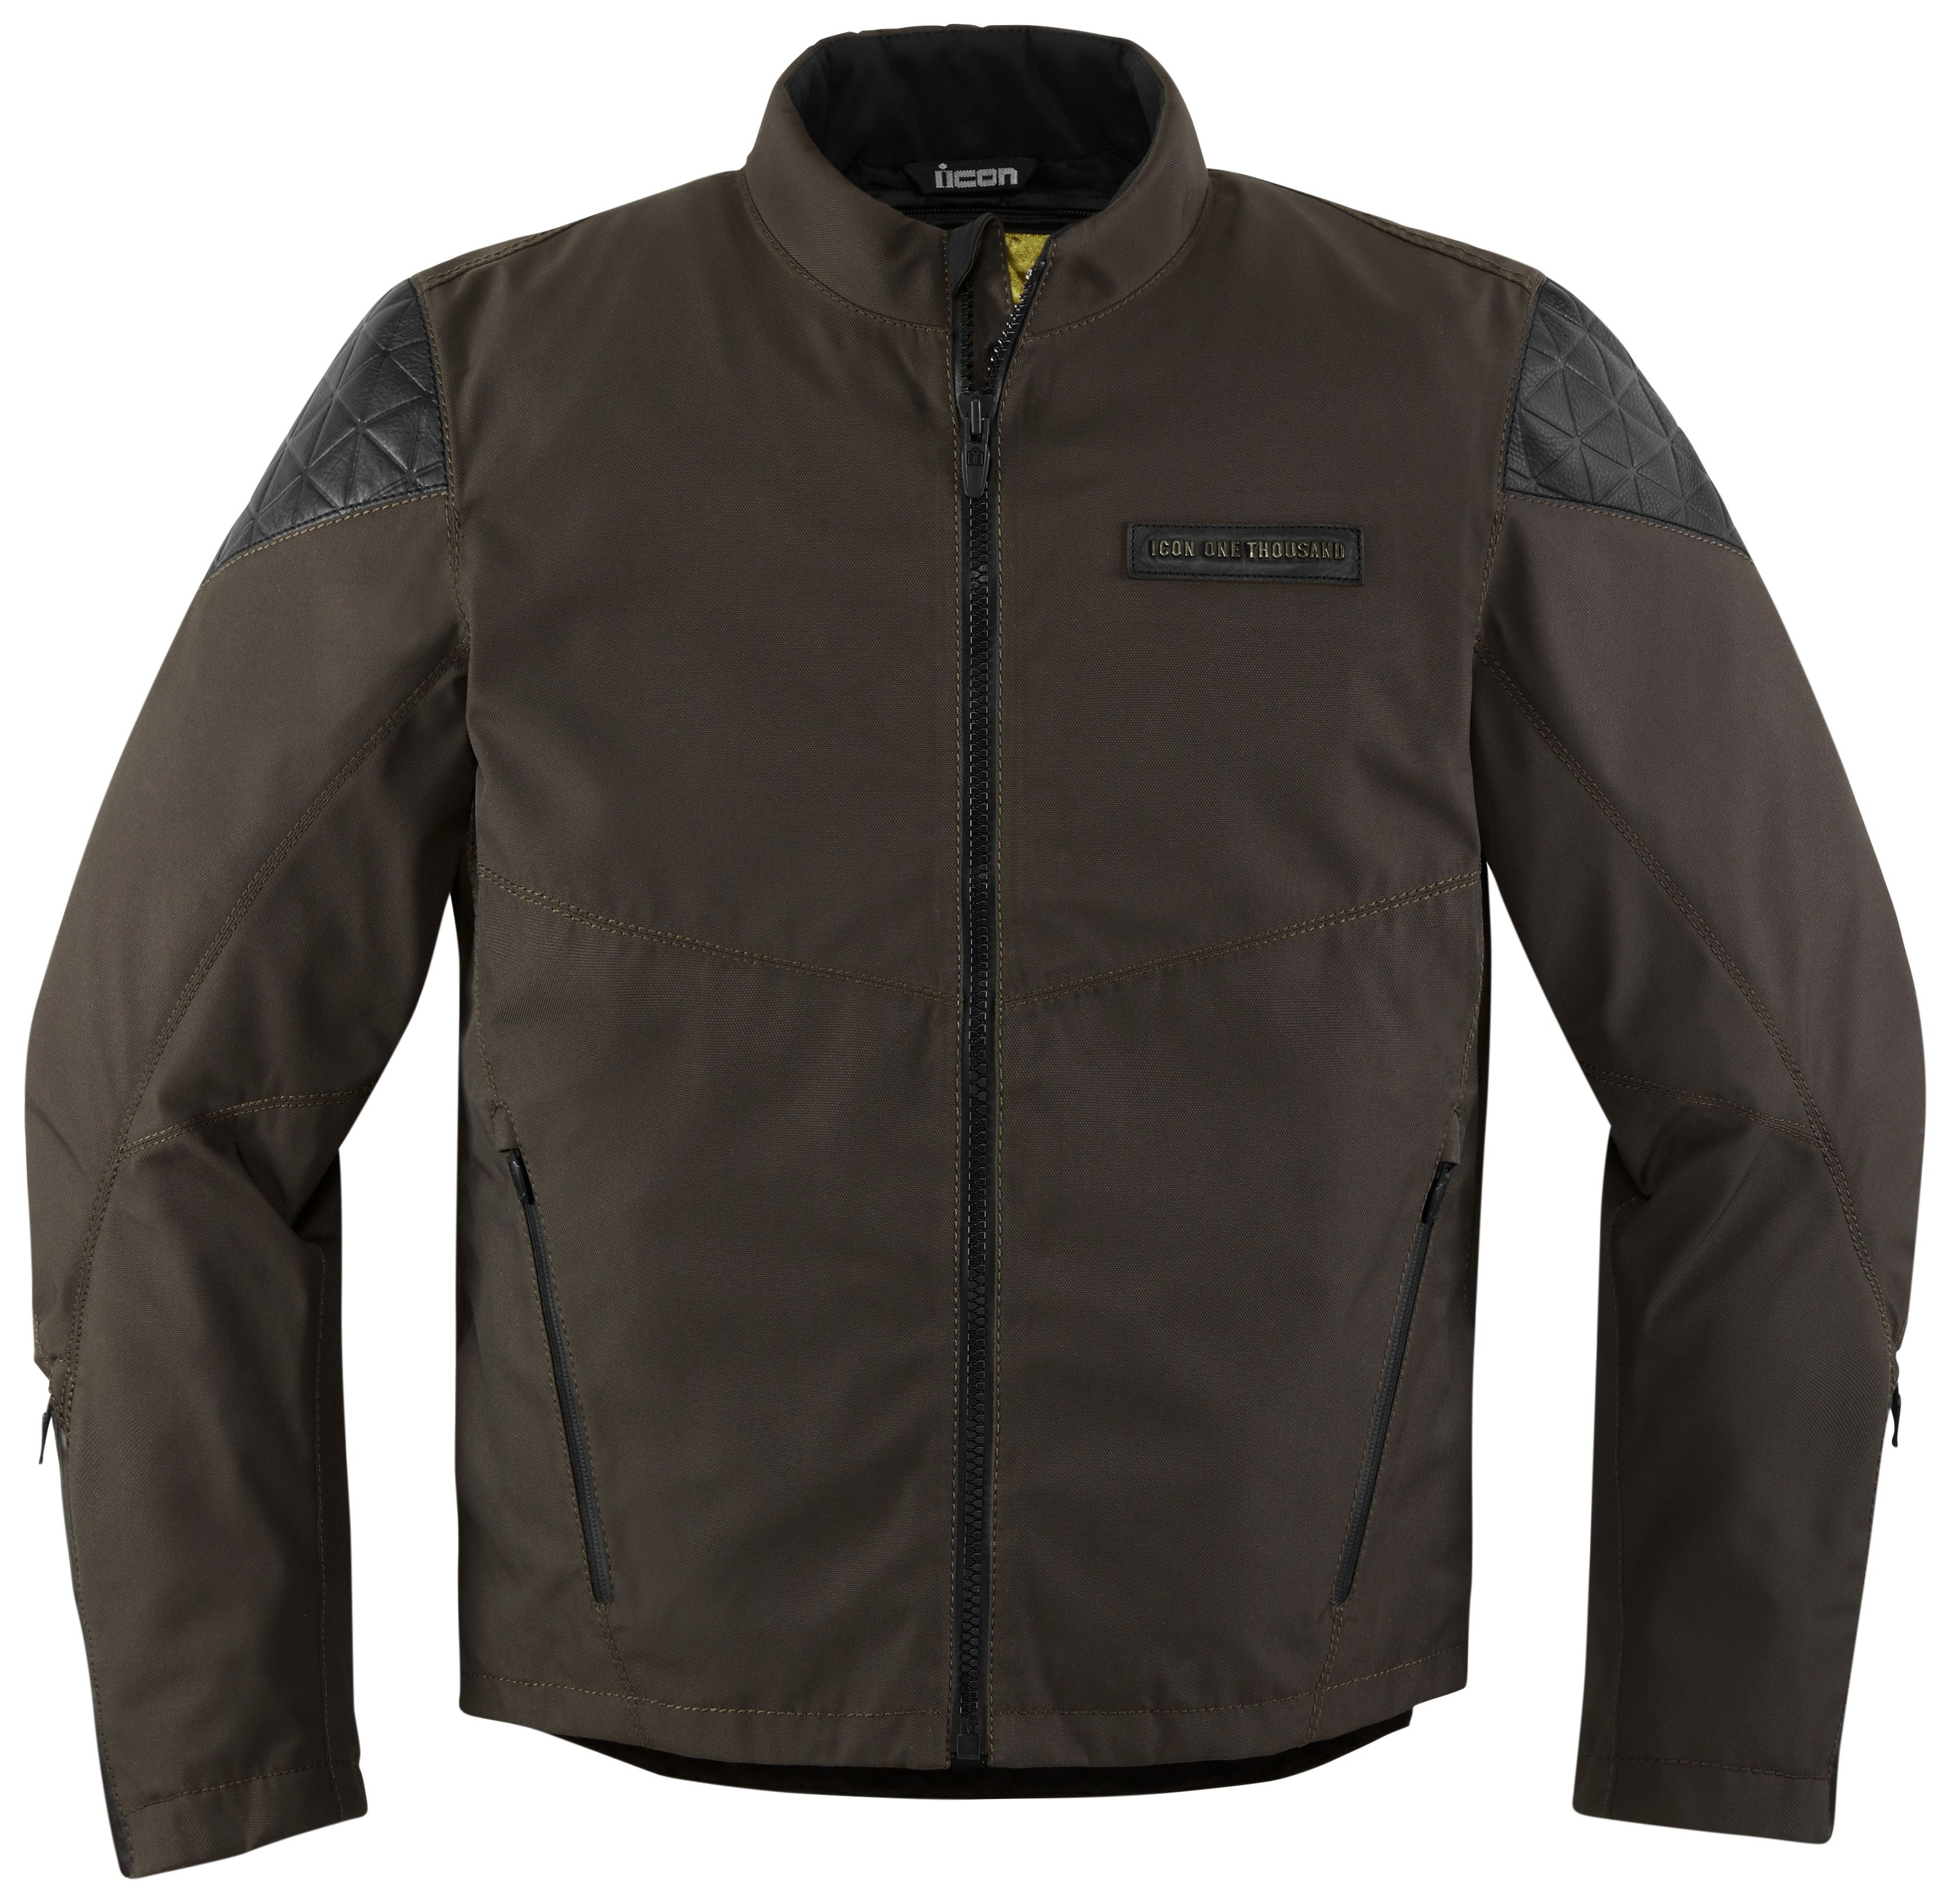 8ce3d7cda33d2 Amazon.com: GDM-01 Mesh Motorcycle Jacket (Medium): Automotive | سترا رجالي  in 2019 | Motorbike jackets, Motorcycle, Motorcycle jacket